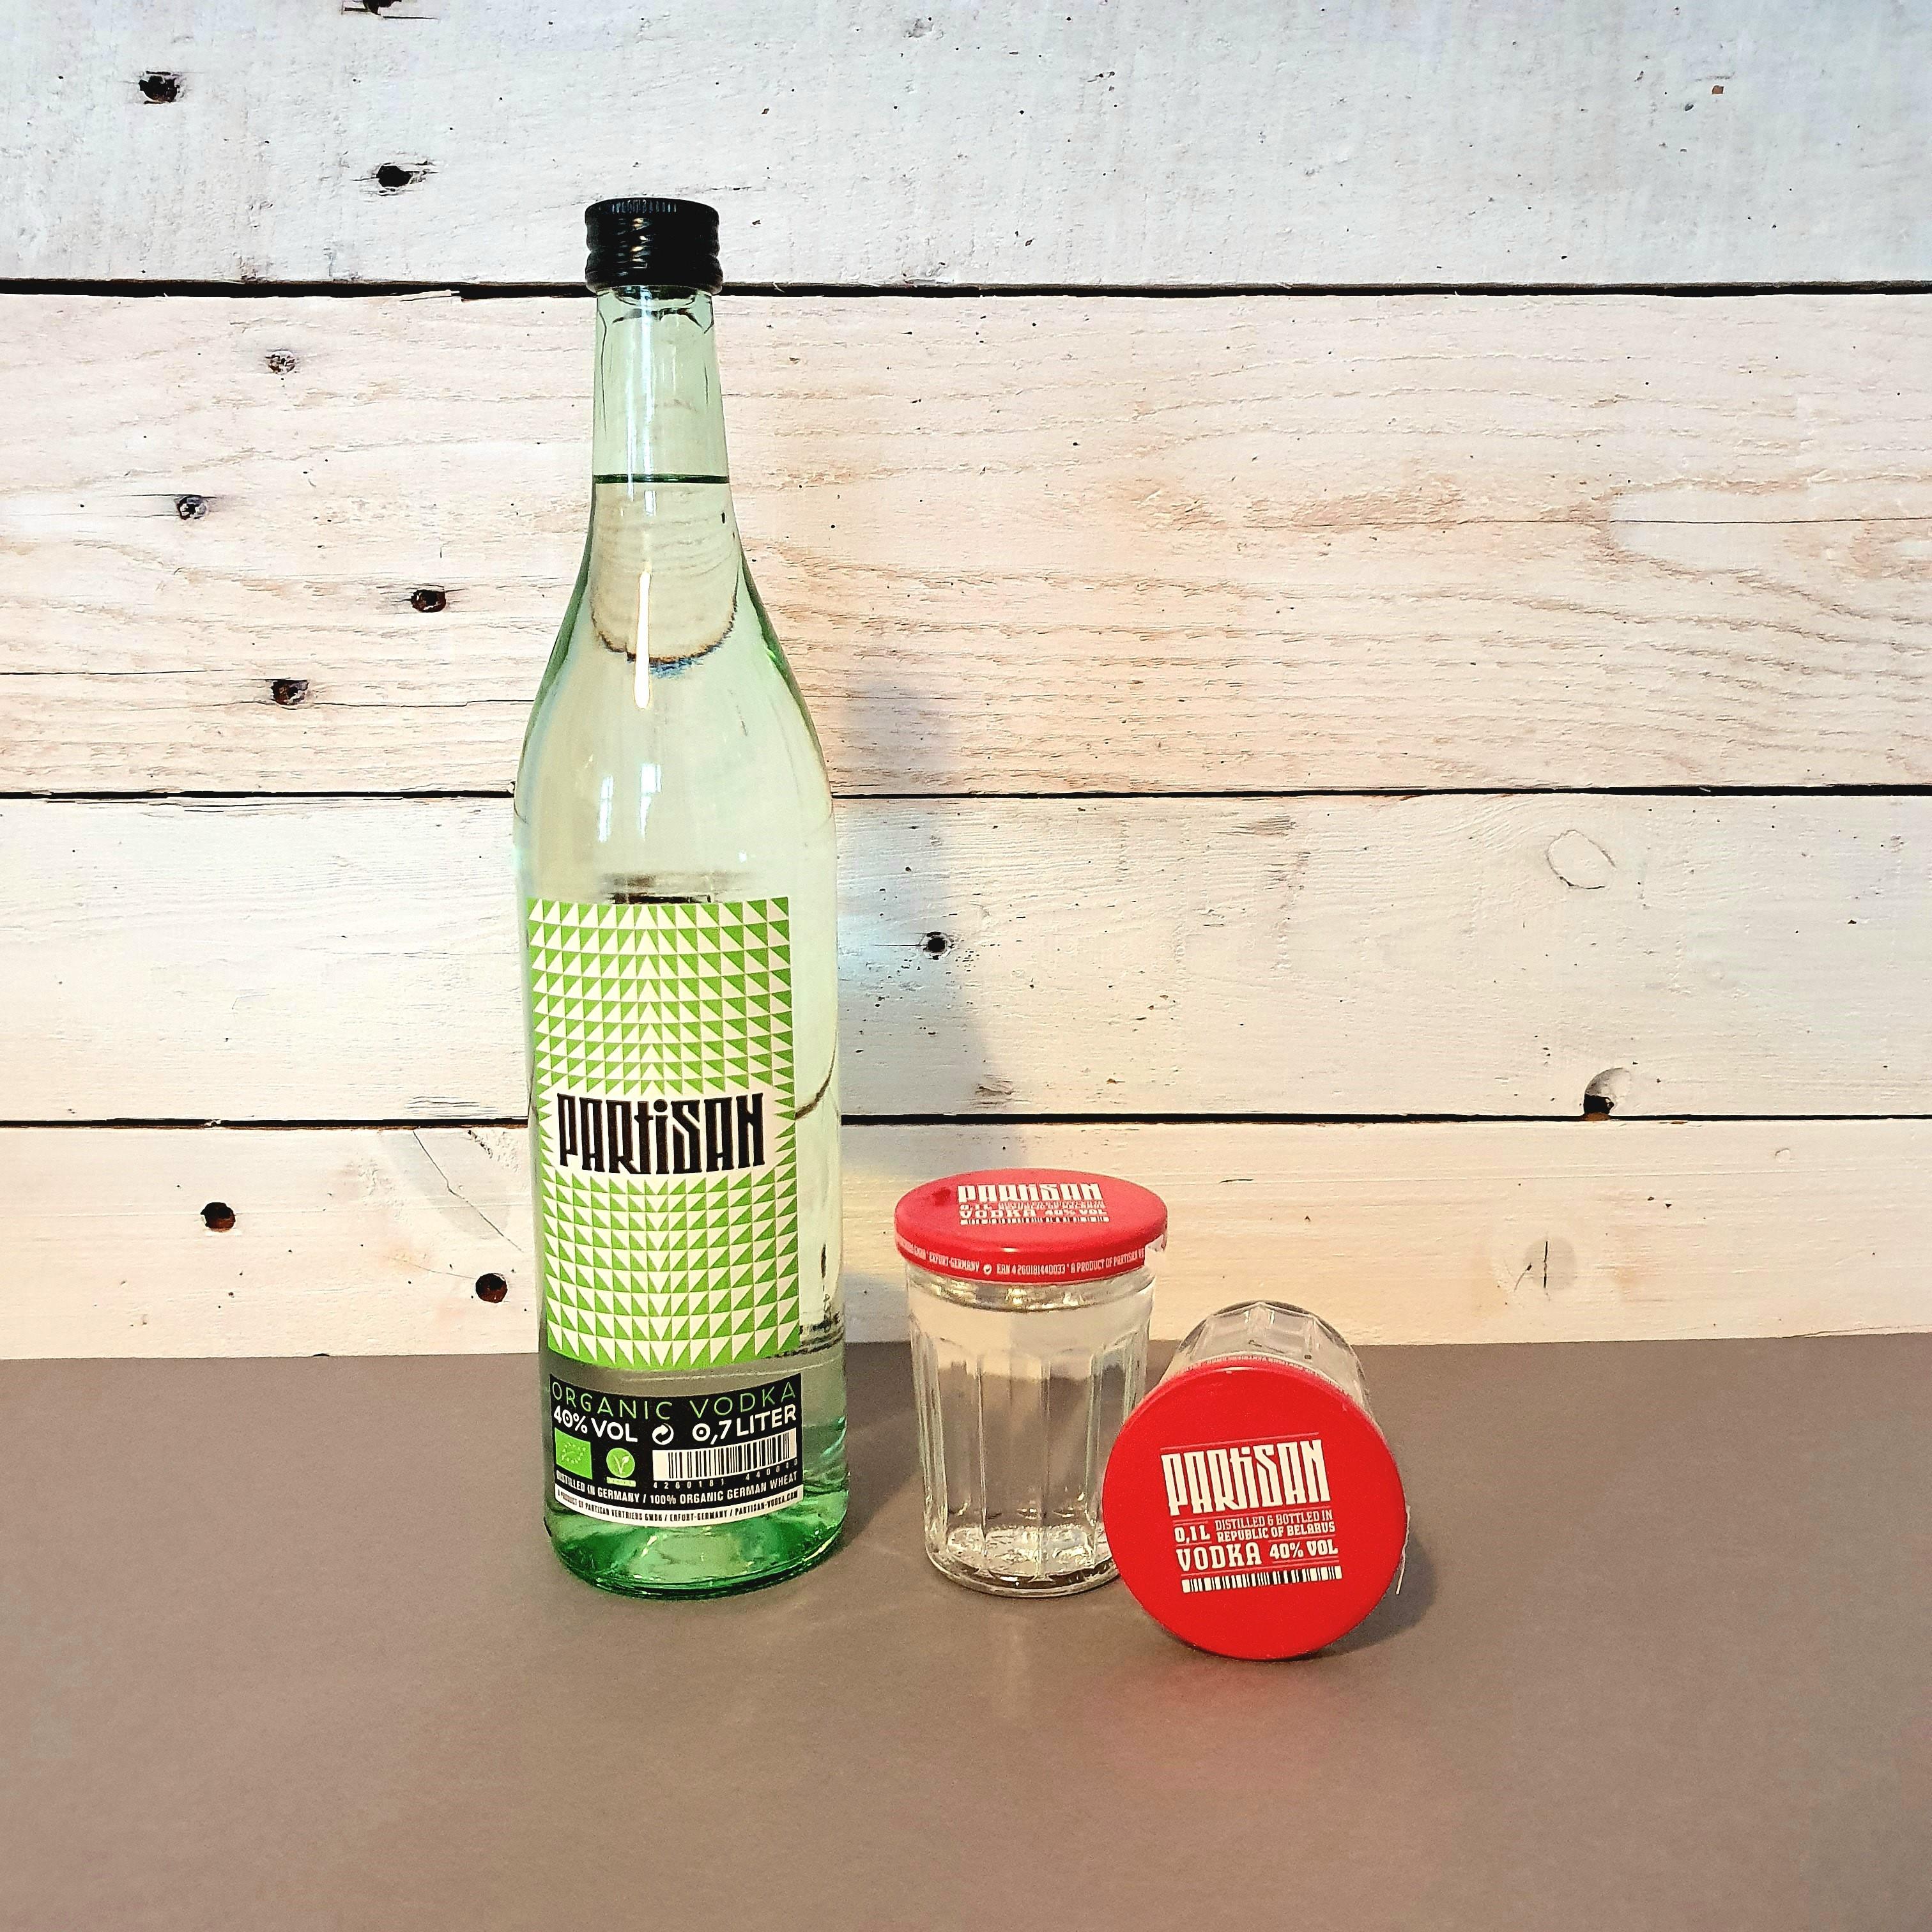 Partisan Vodka